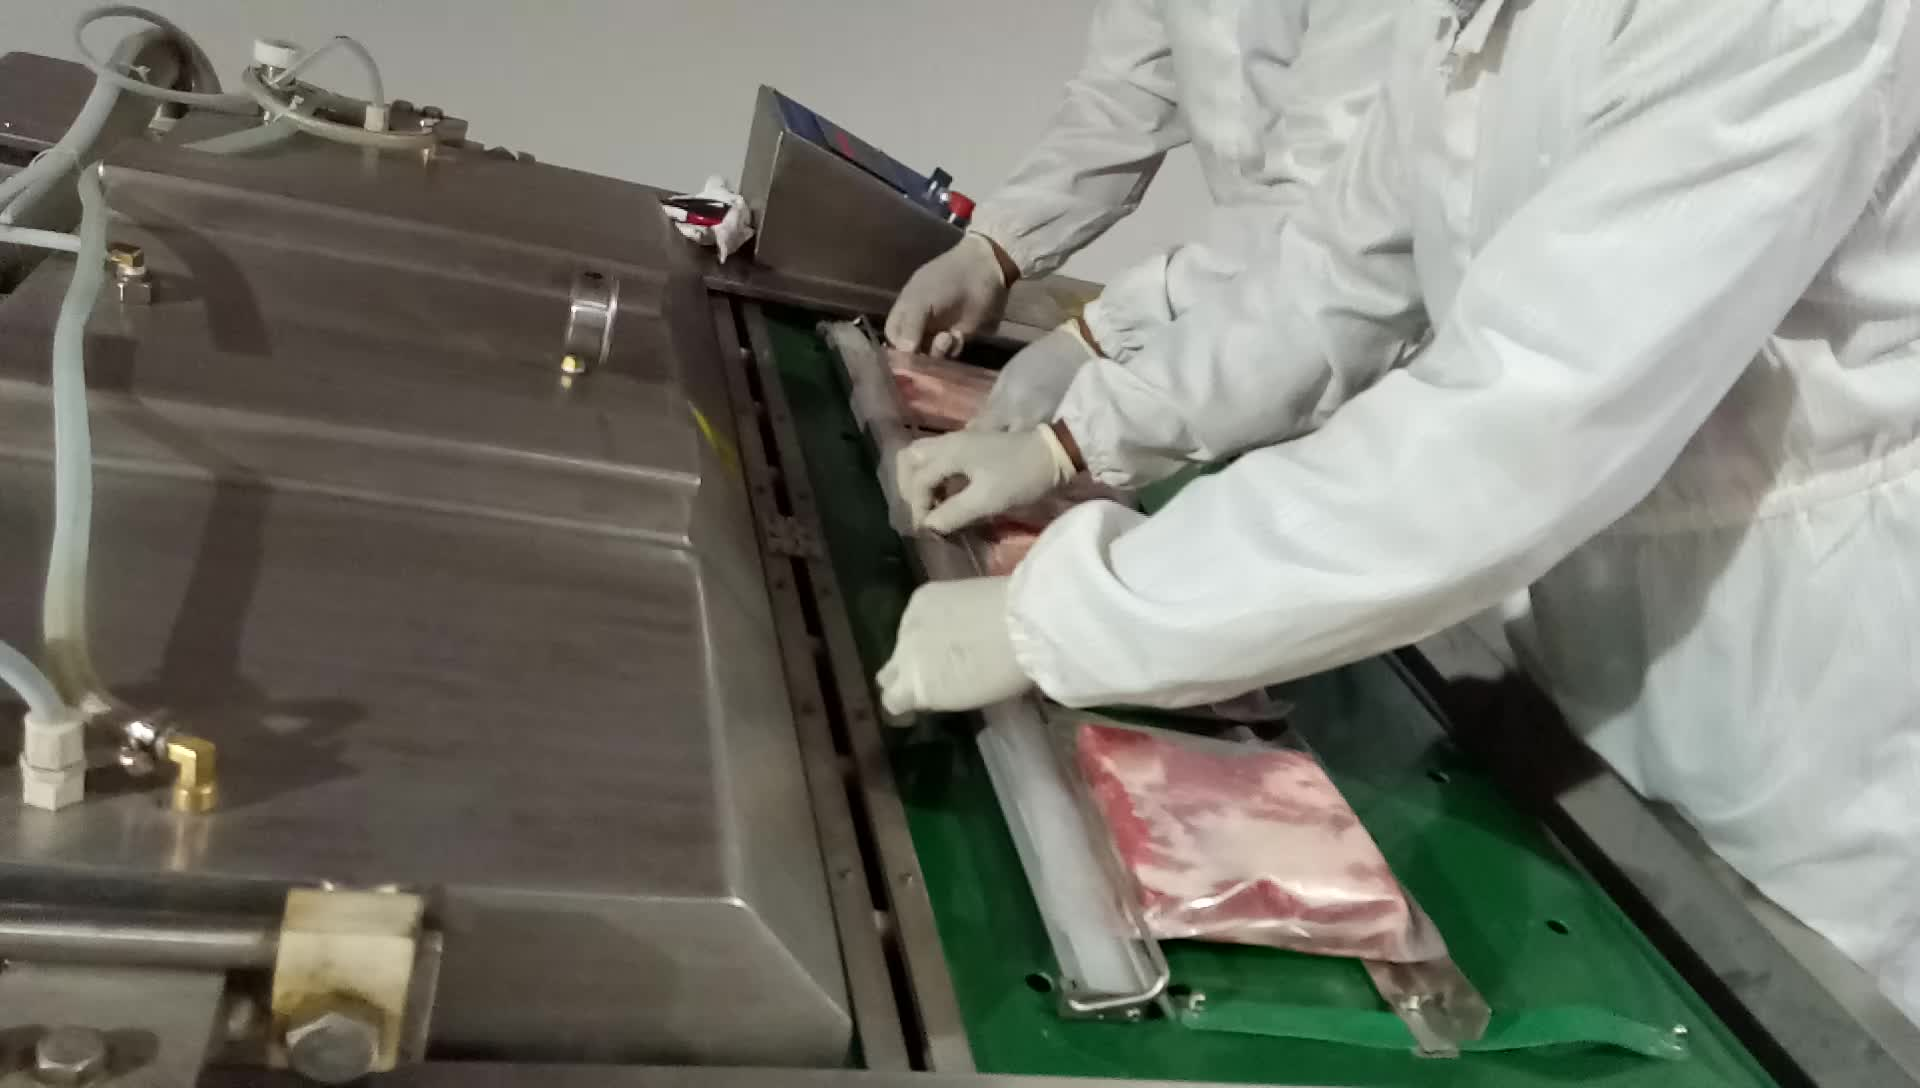 Kecil babi pembantaian pabrik pengolahan daging